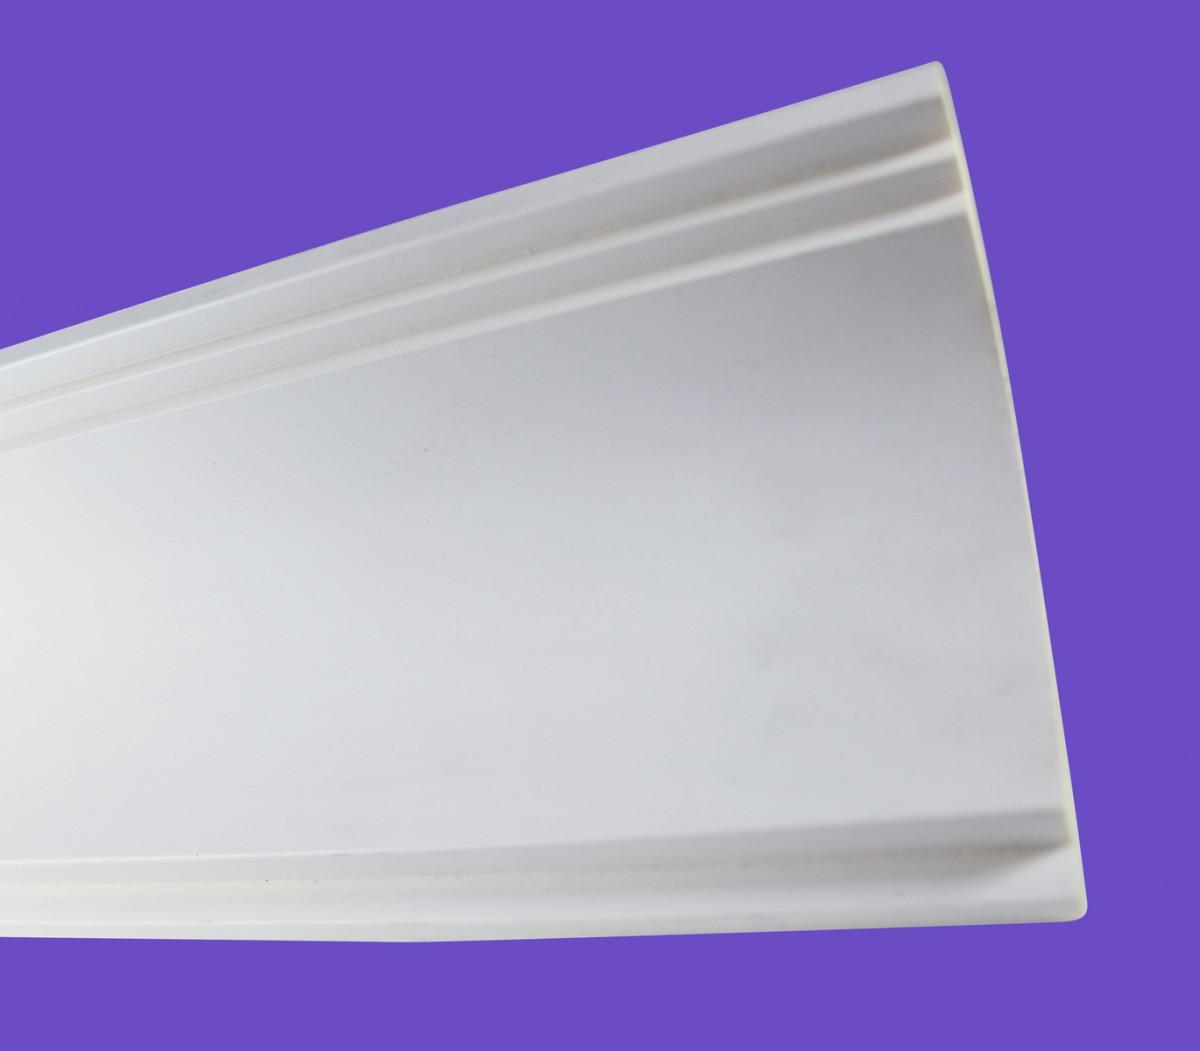 Cornice White Urethane 23.5 Sample of 11775 Cornice Cornice Moulding Cornice Molding